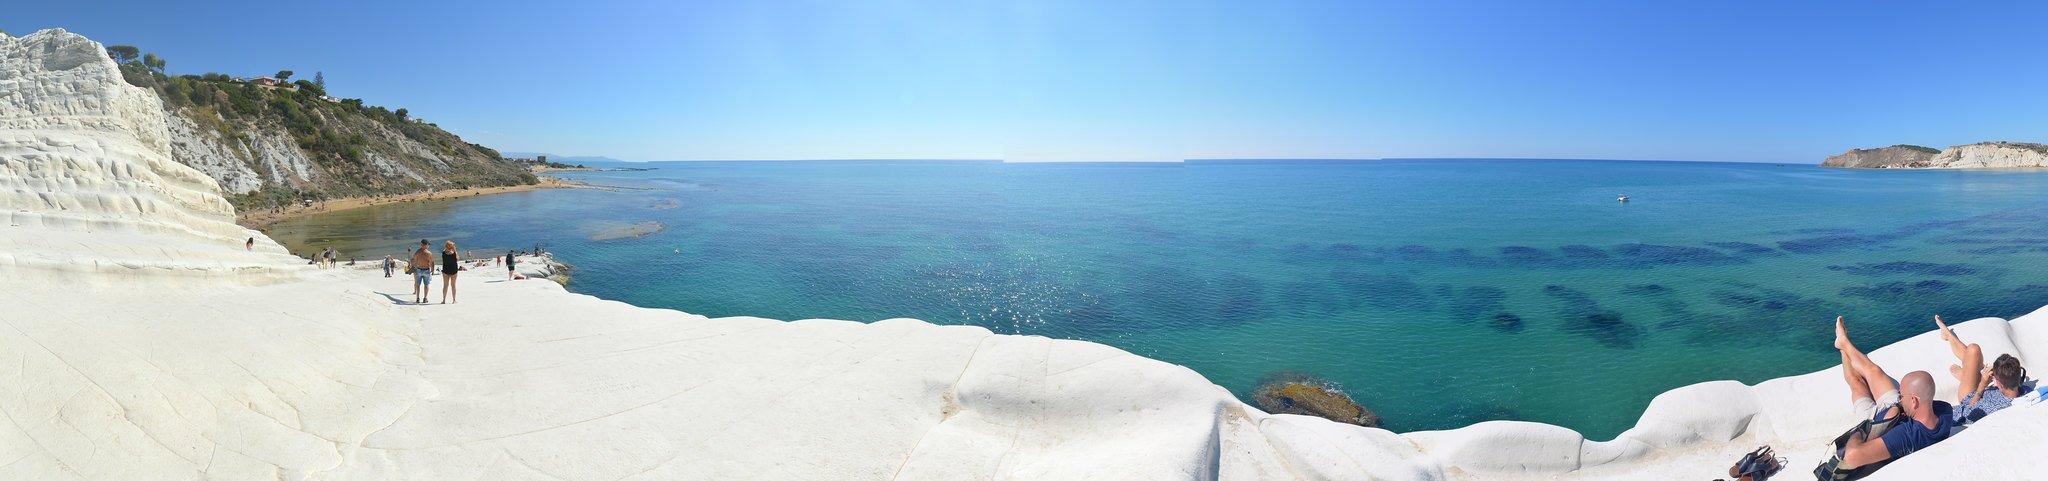 Scala dei Turchi, Sicily, Italy beaches